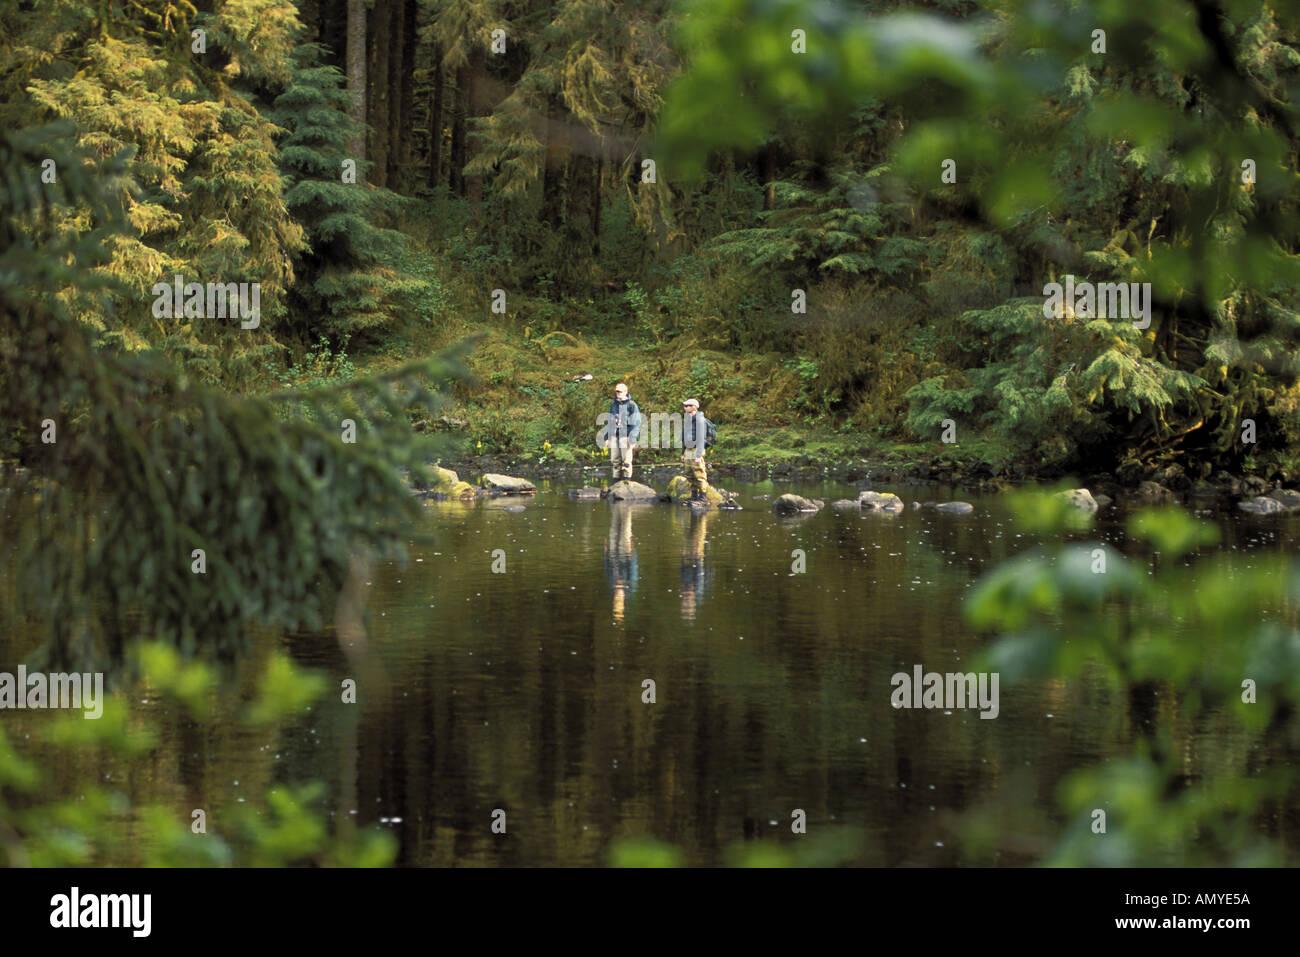 wales karta Flyfishermen on Karta River Prince of Wales Is SE AK Summer Stock  wales karta